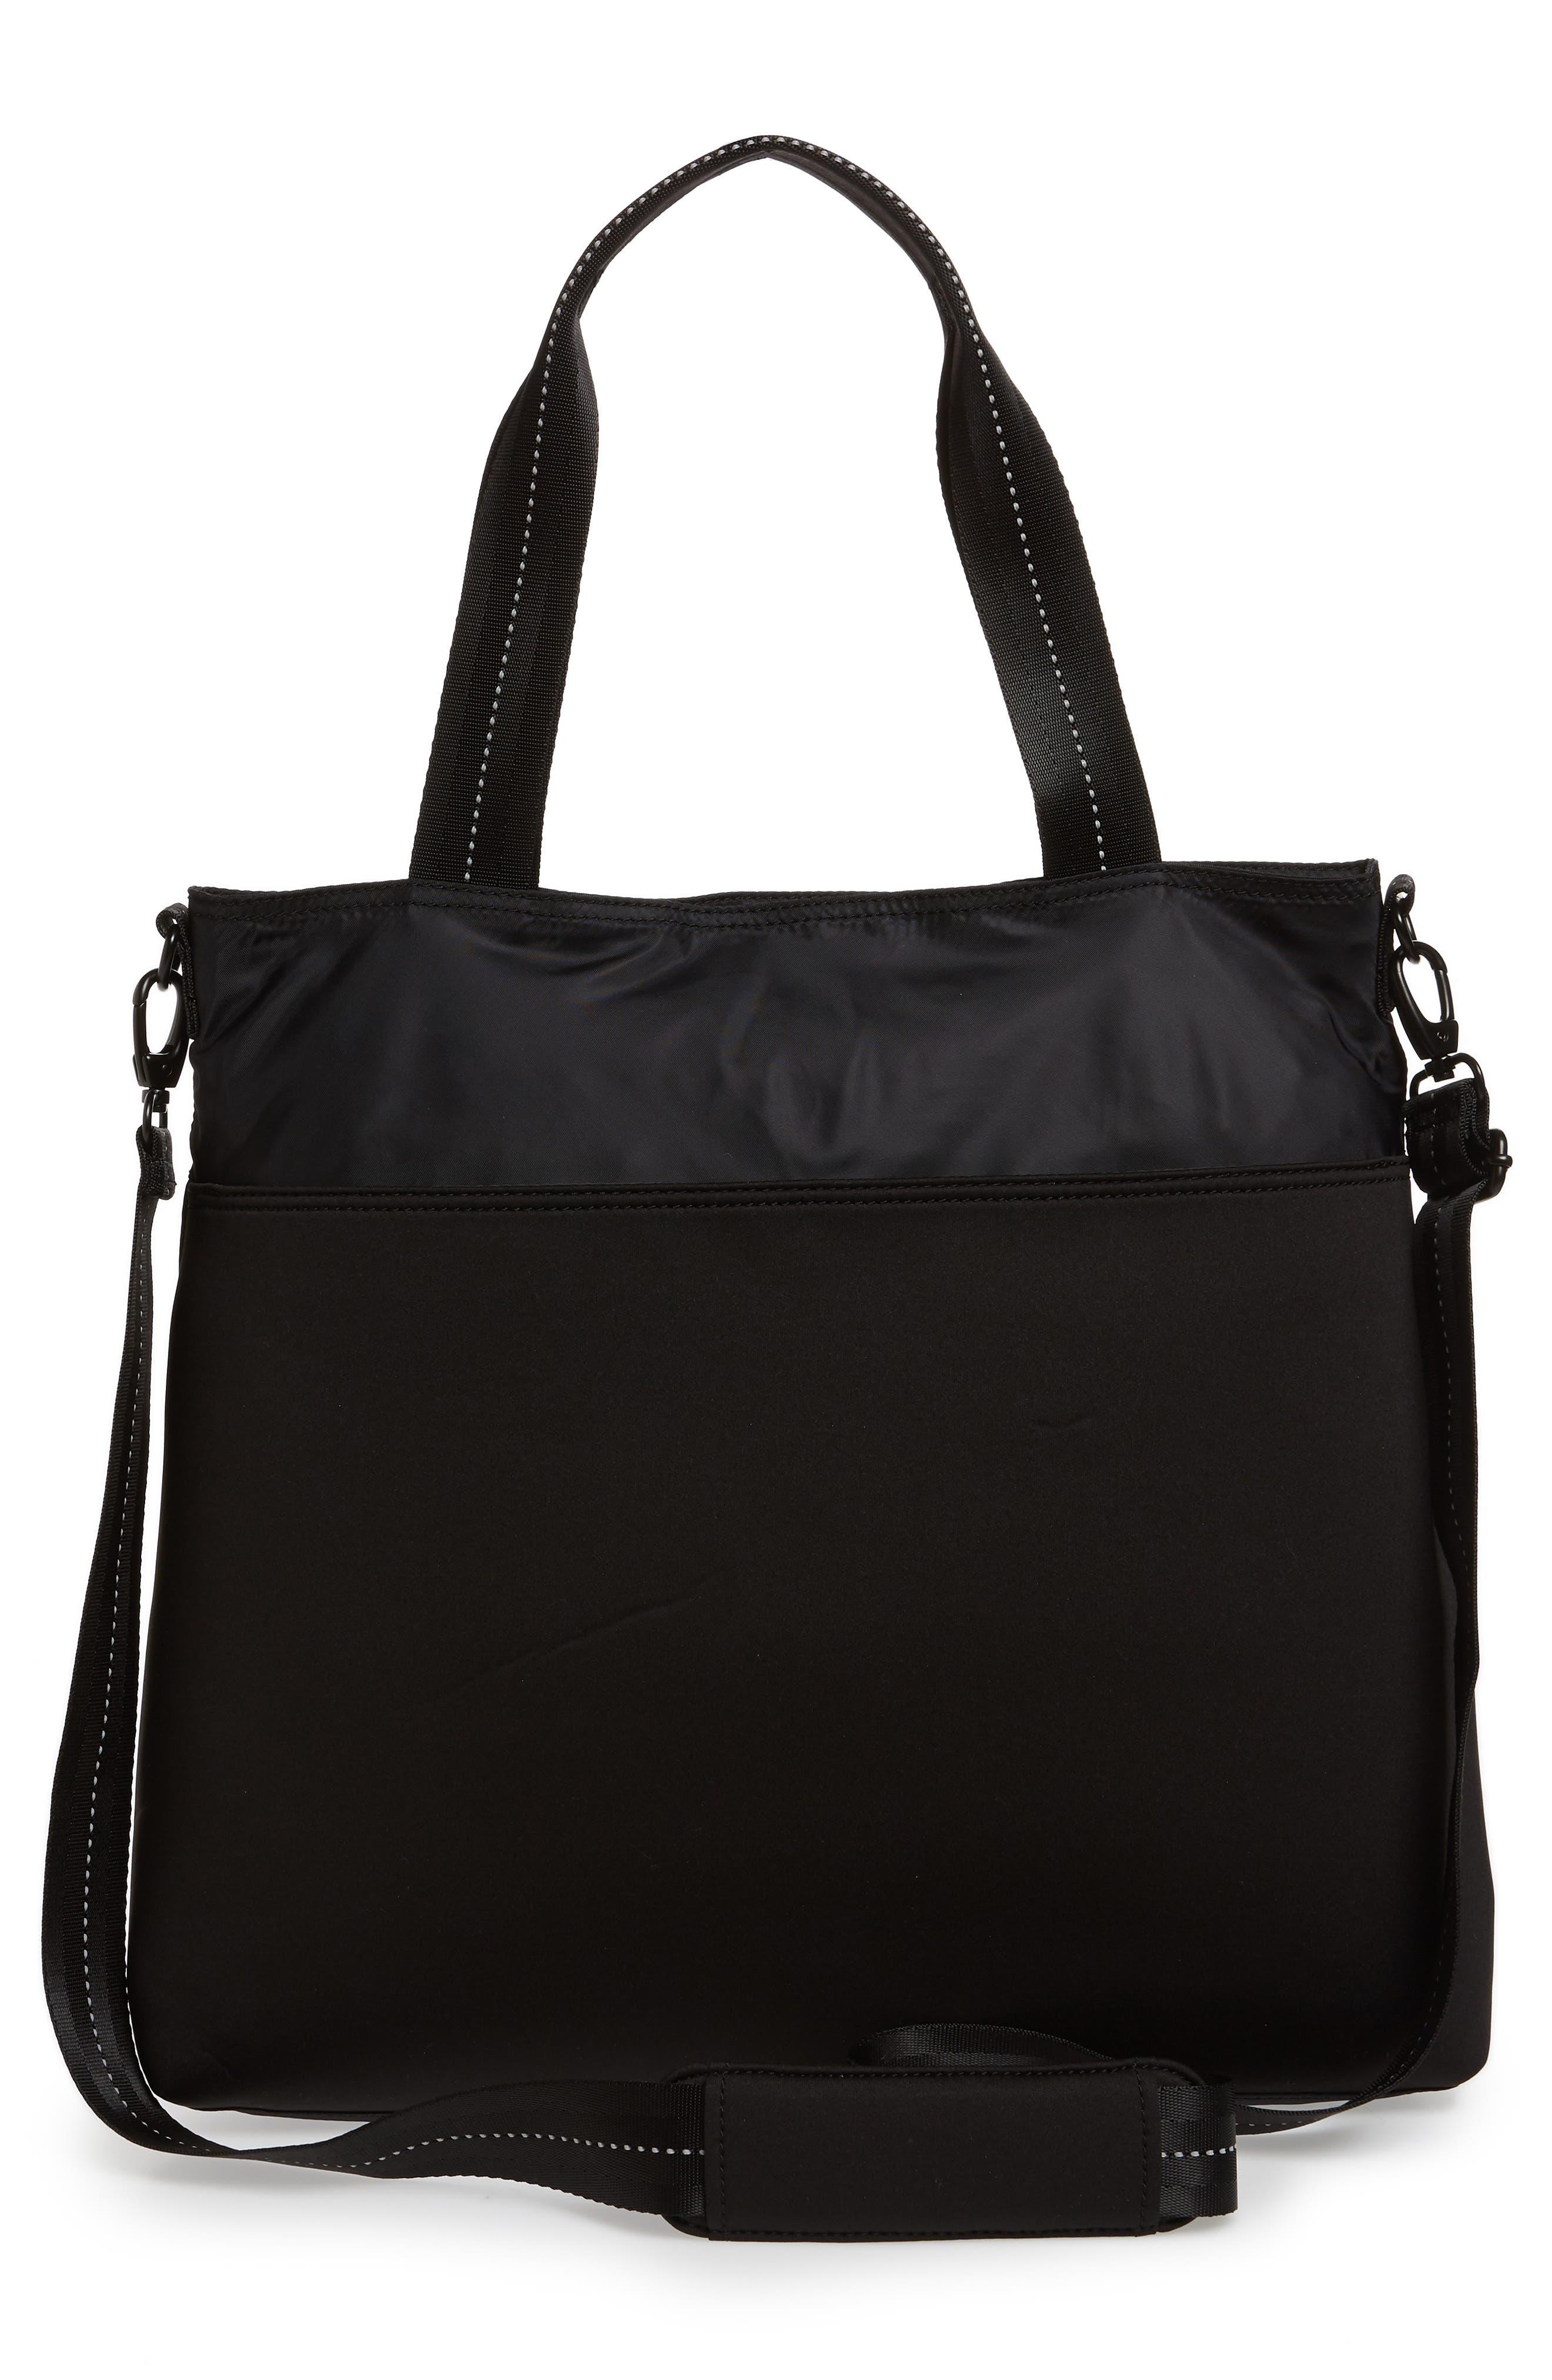 ZELLA, Reflective Nylon Tote Bag, Alternate thumbnail 4, color, BLACK